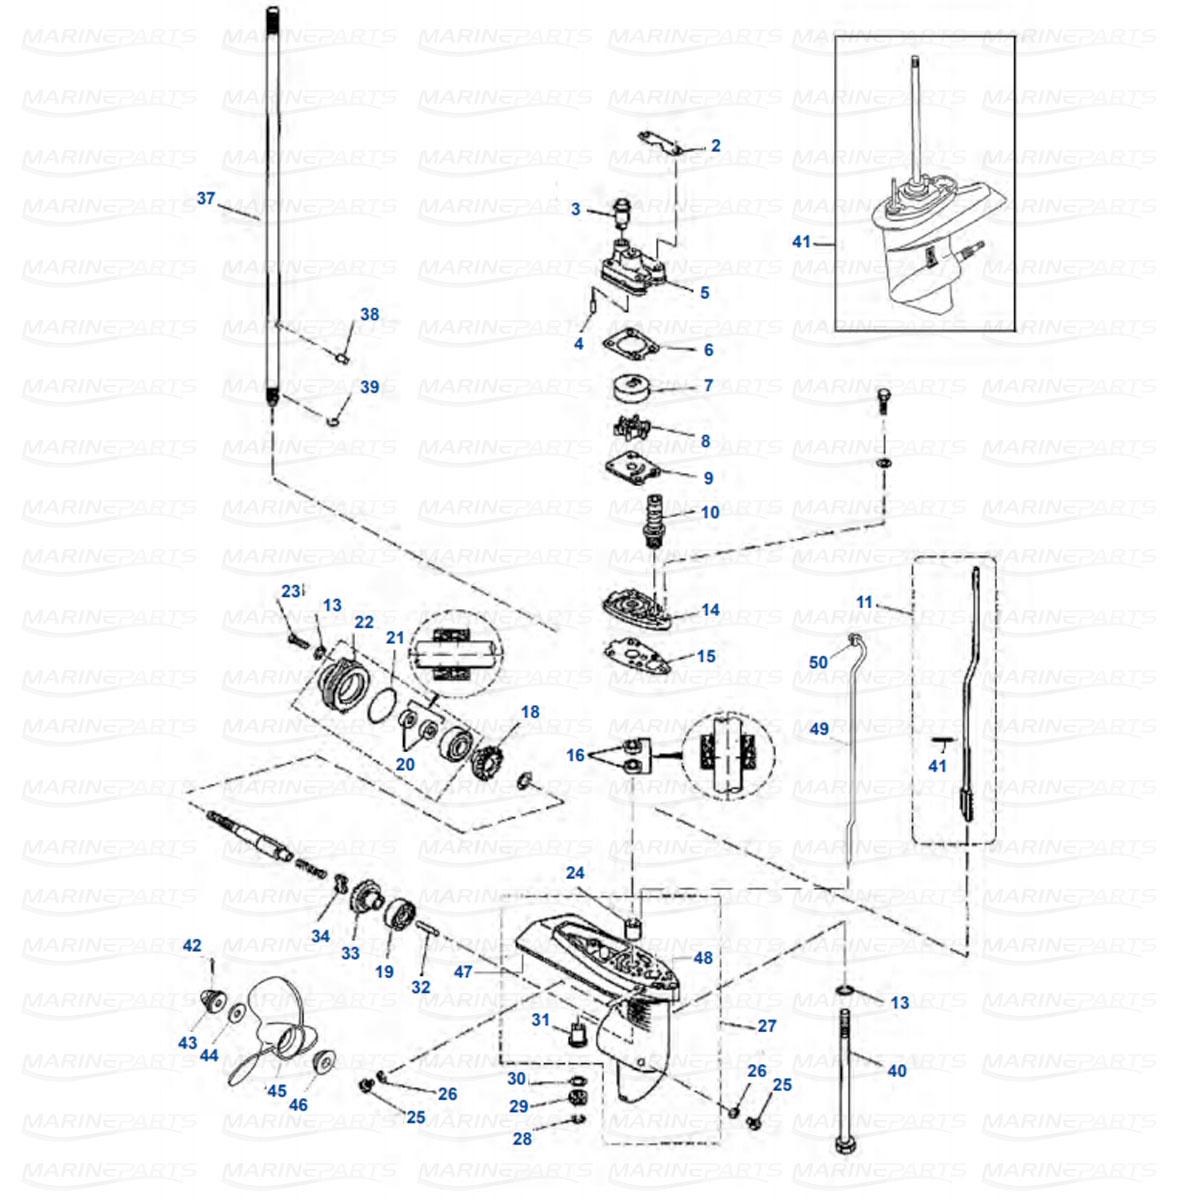 Gearcase parts Yamaha F4 (1998-2009)